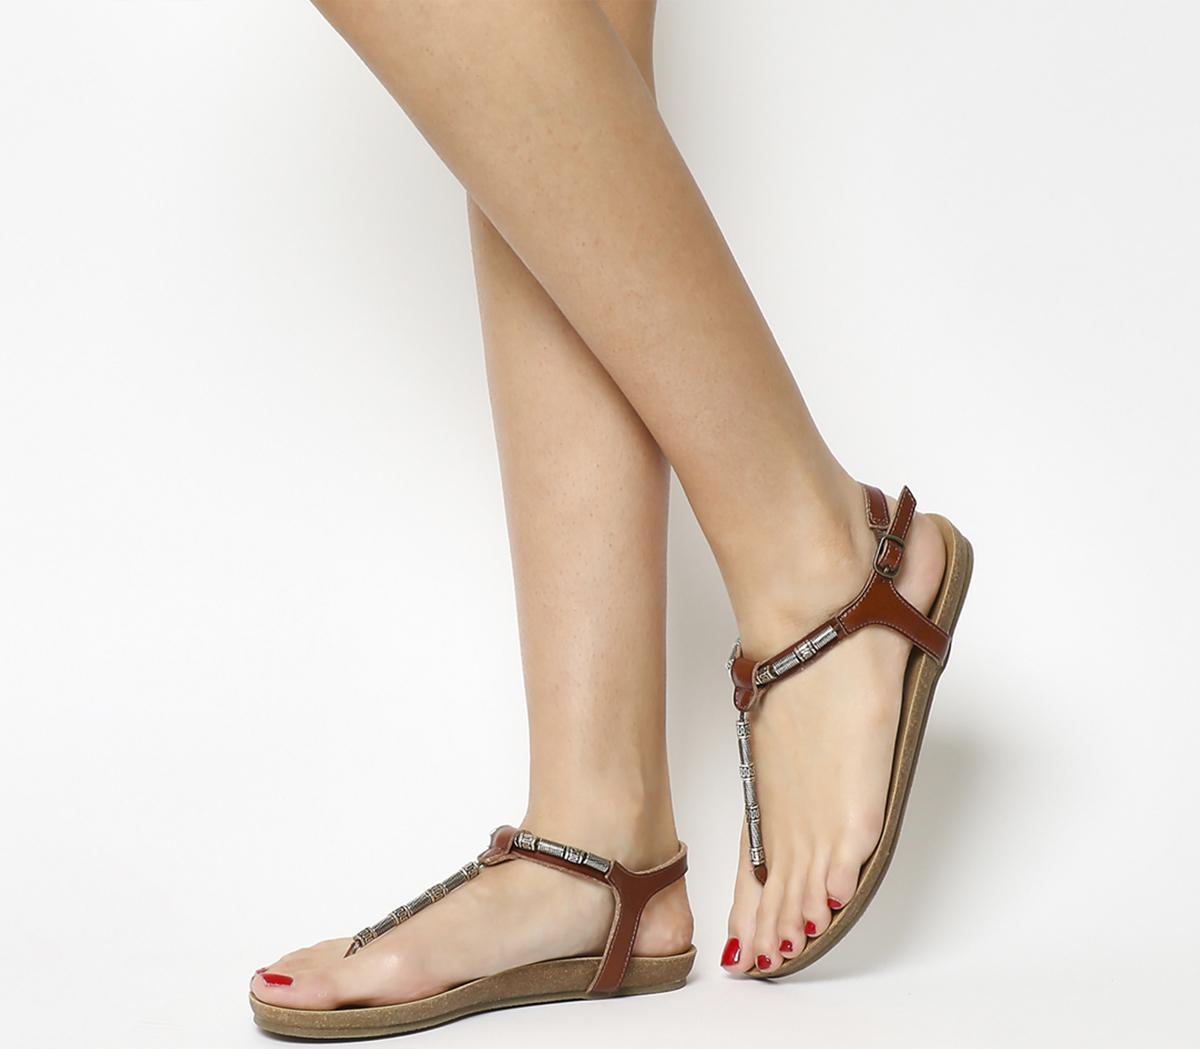 Galoya Sandals